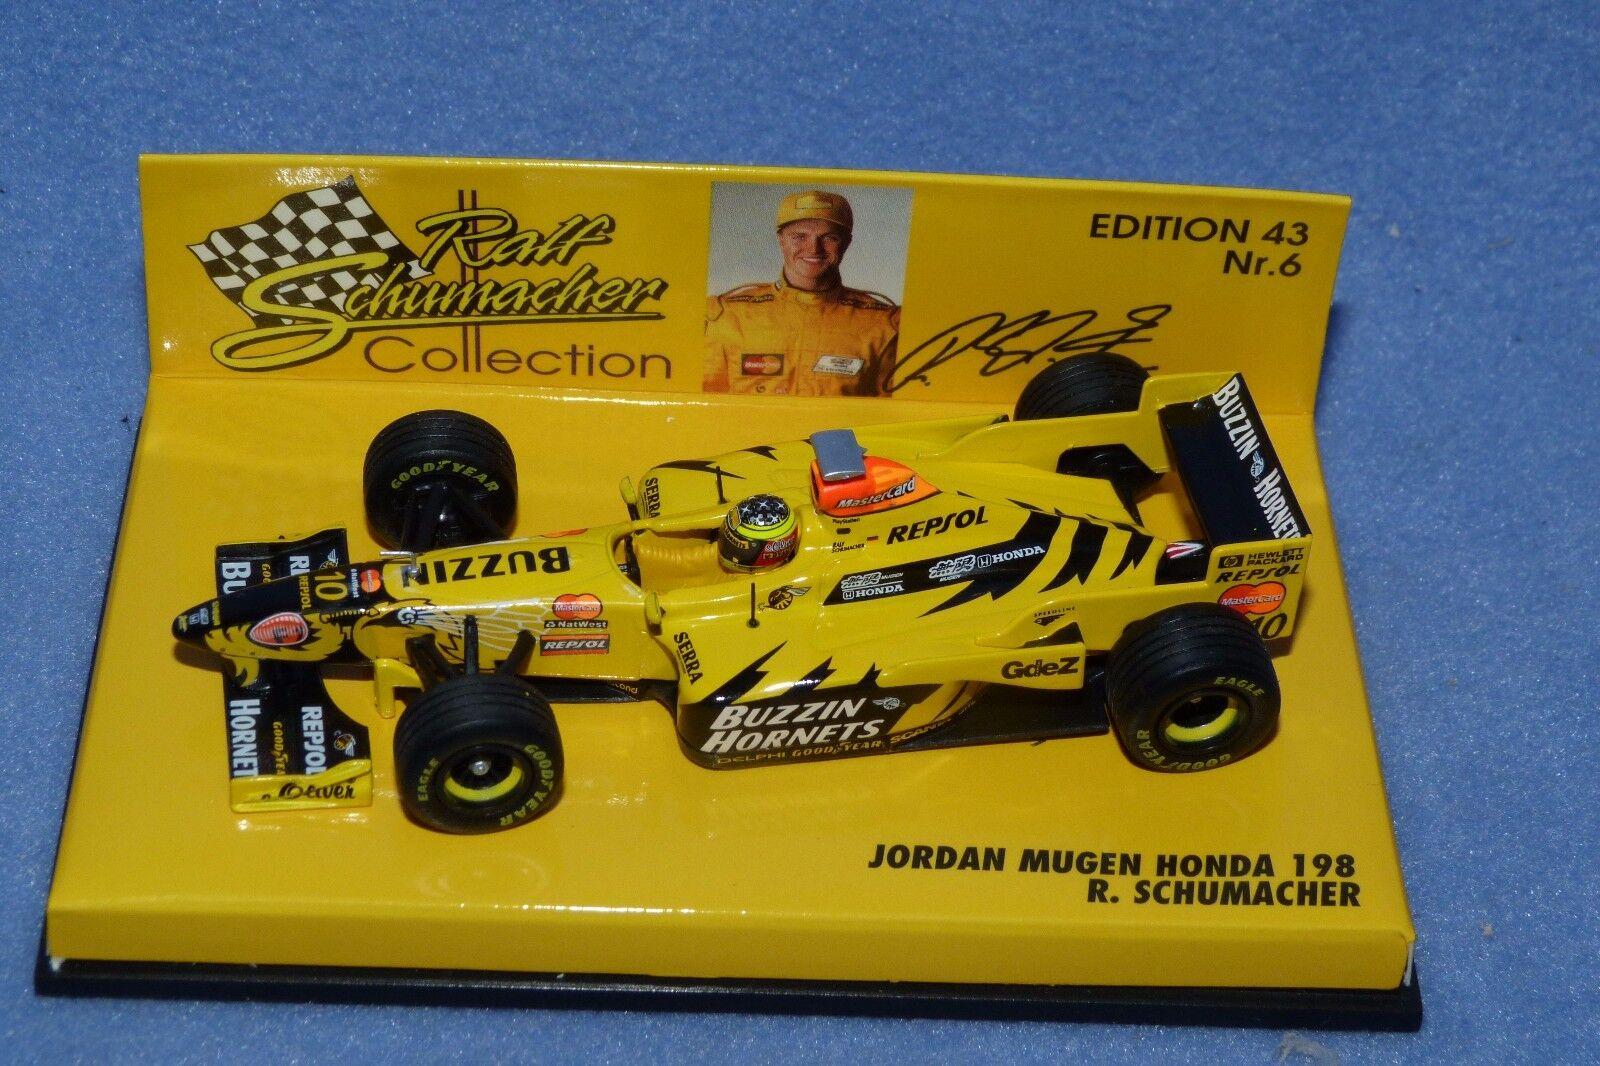 1 43 Ralf Schumacher Jordan Mugen Honda 198  F1 1998